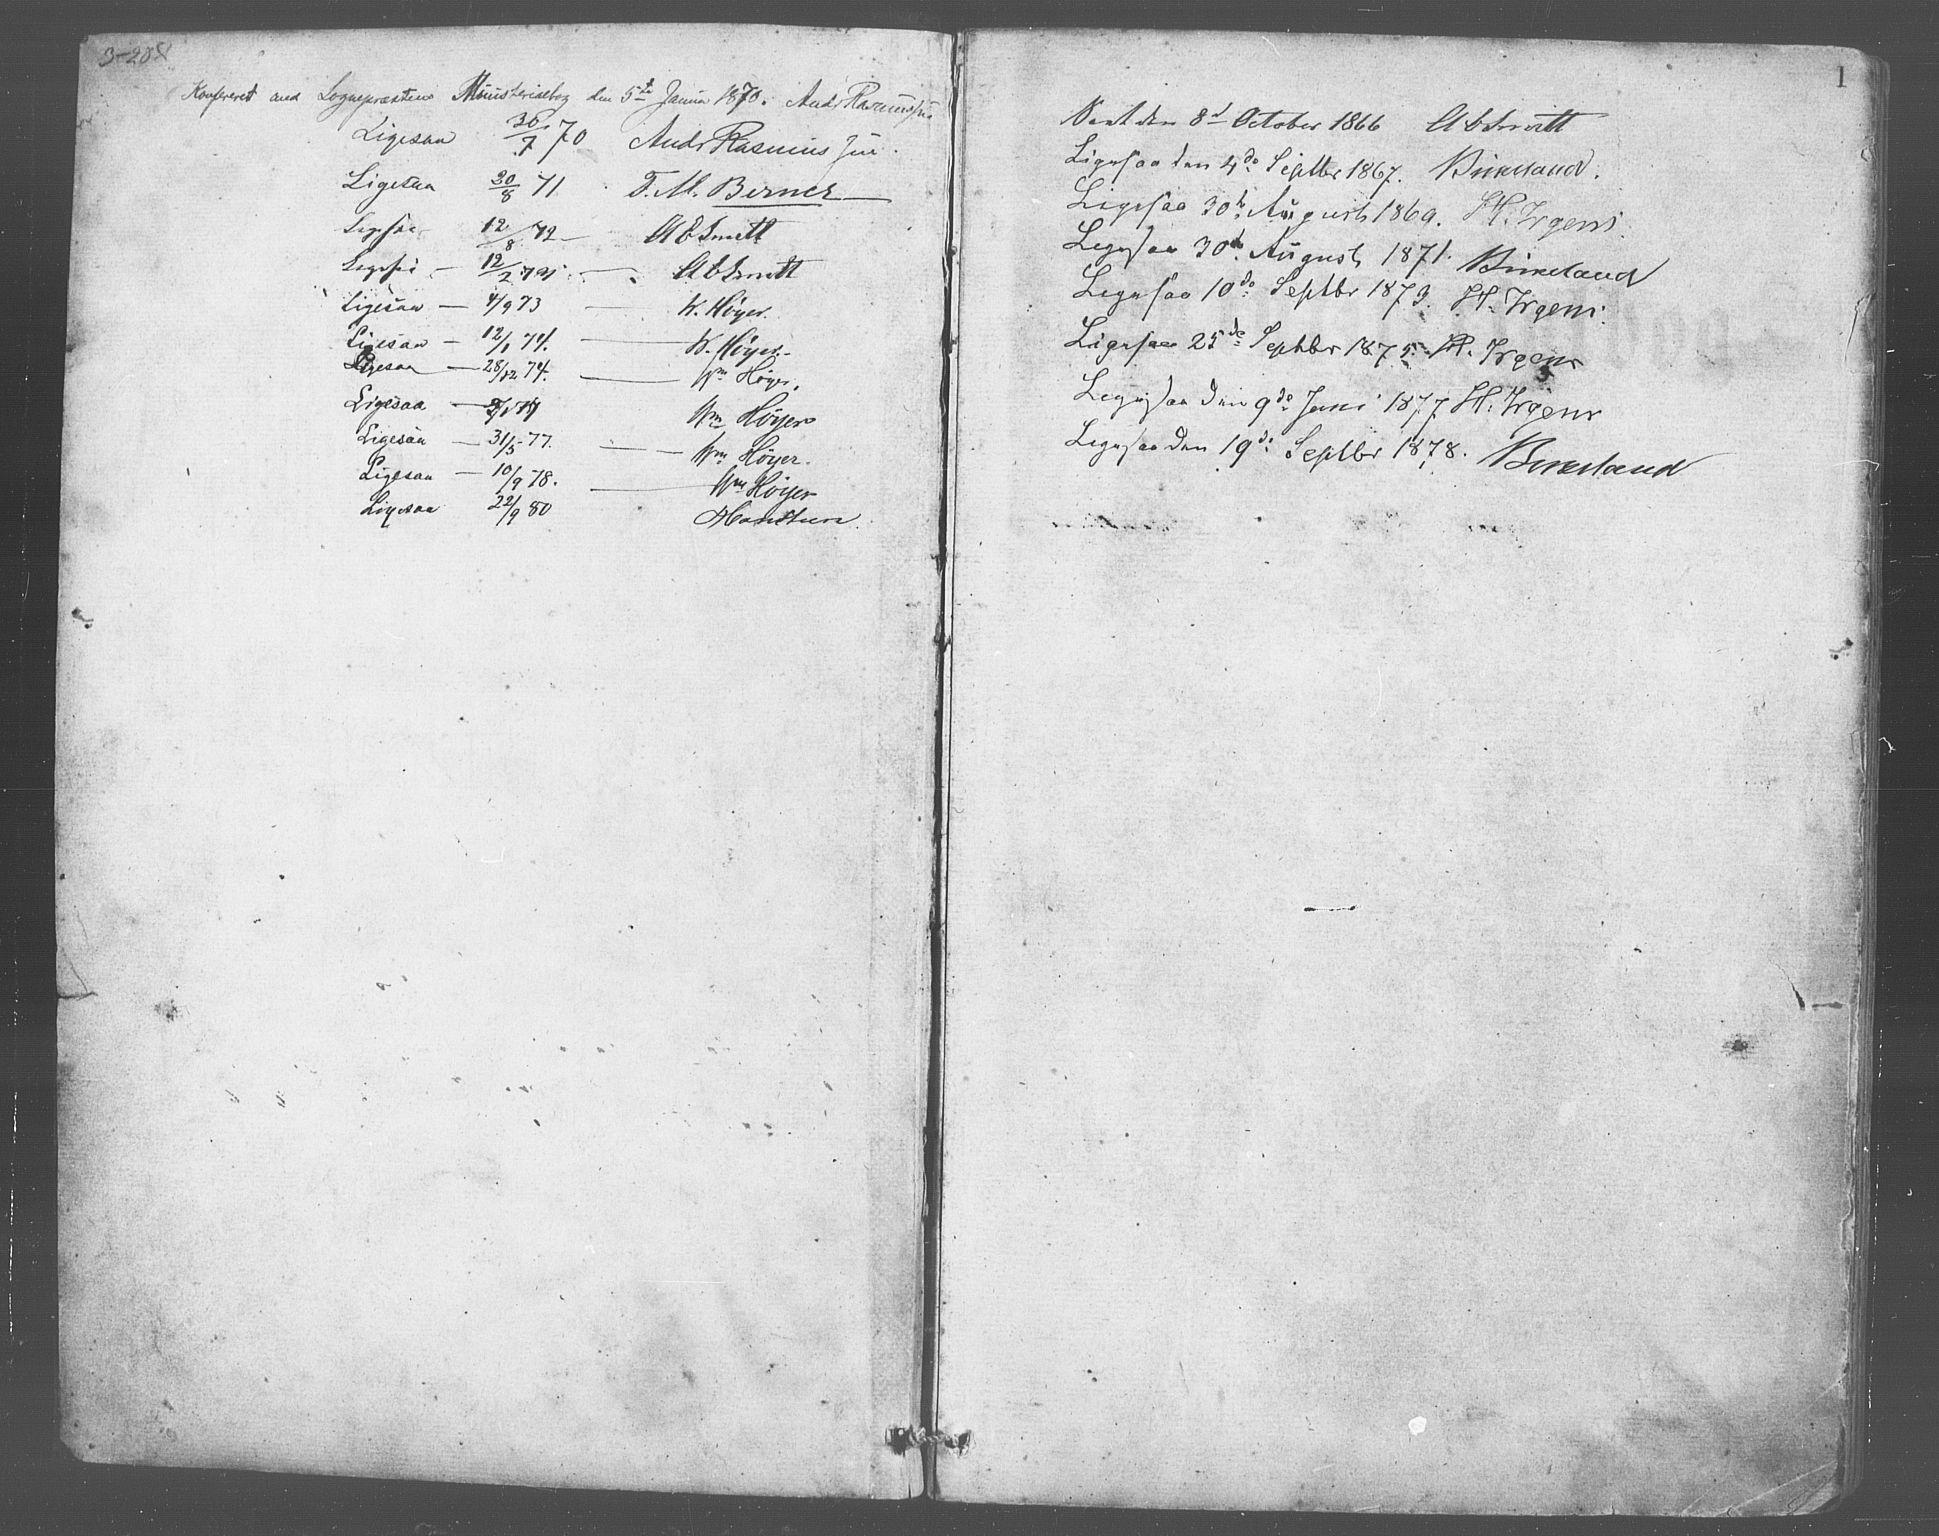 SAB, Evanger sokneprestembete*, Parish register (copy) no. A 2, 1863-1879, p. 1